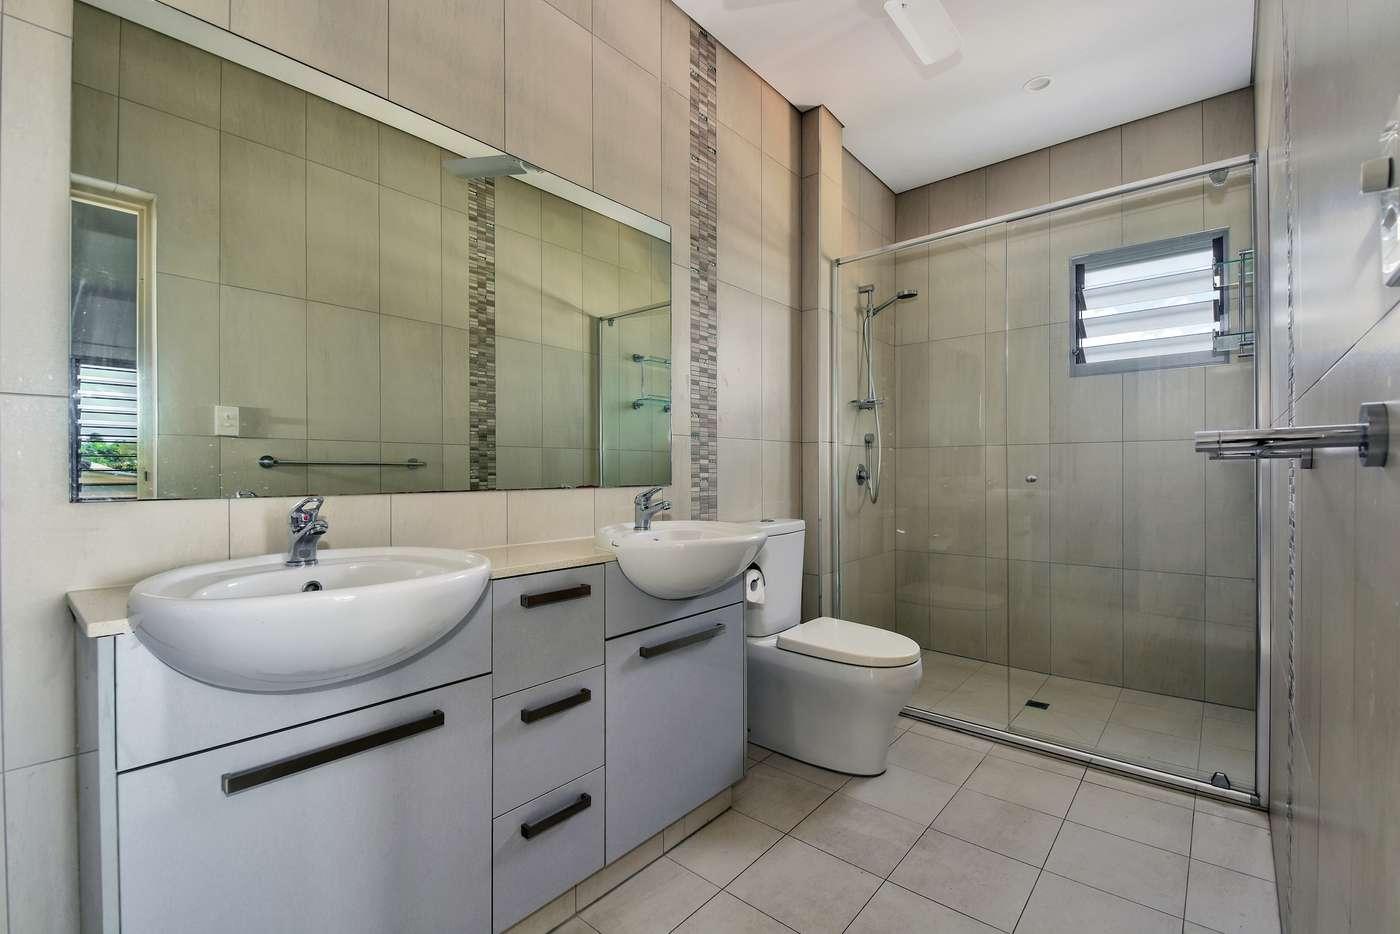 Sixth view of Homely house listing, 2/1 Barratt Street, Muirhead NT 810